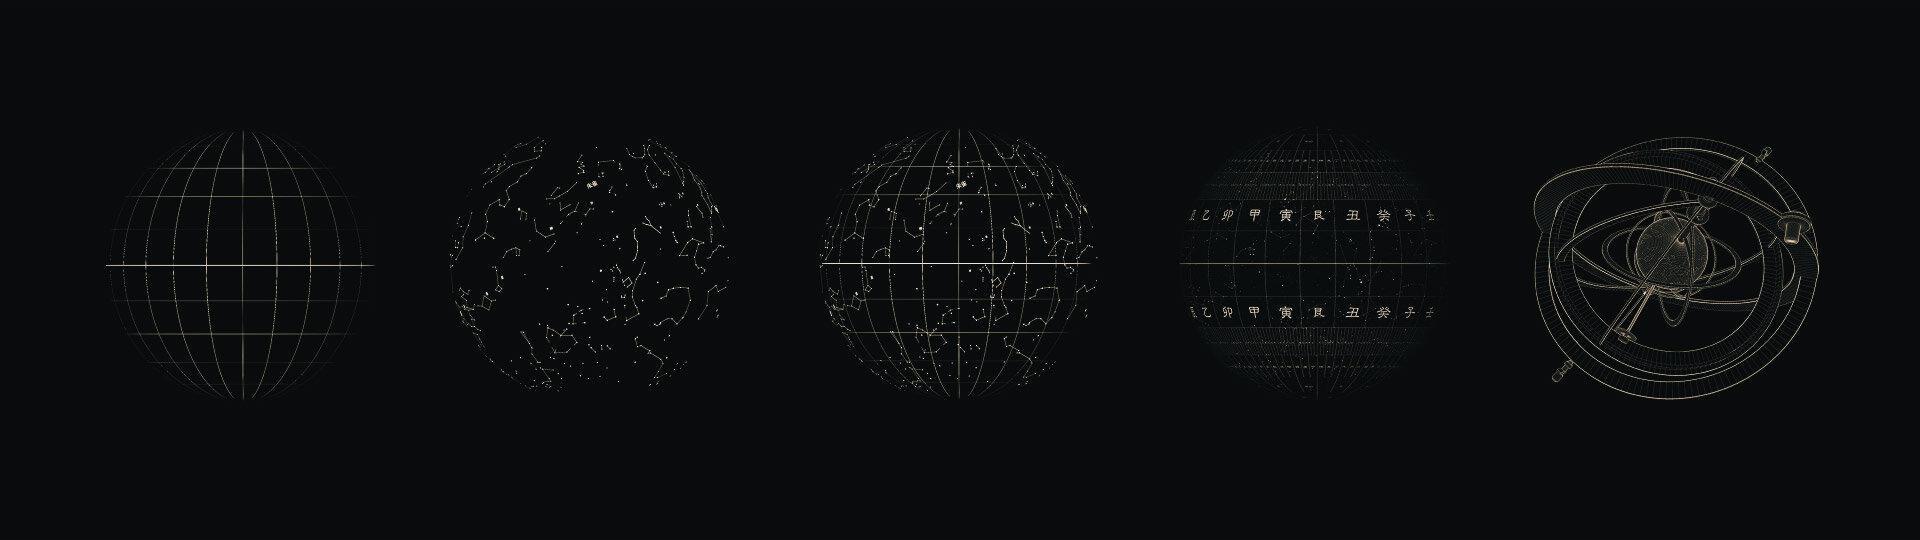 TENCENT_100_Astrolabe-A_00000.jpg